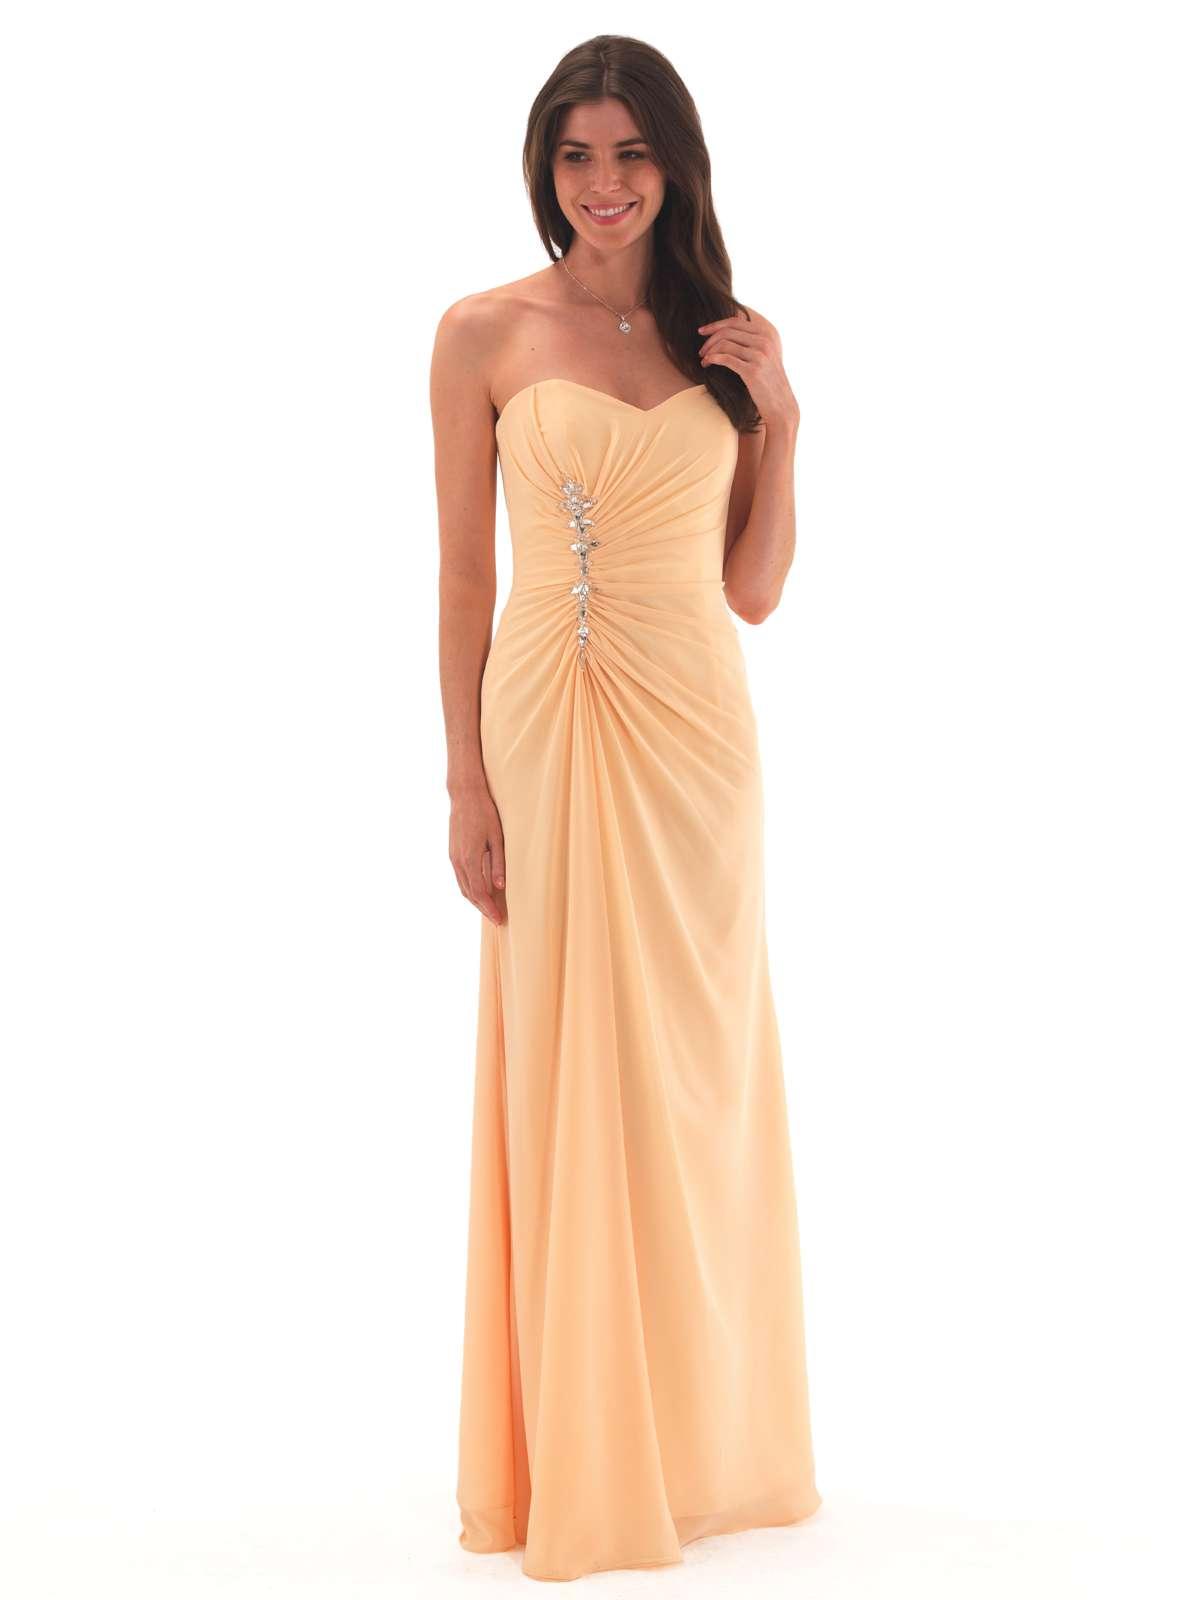 Gorgeous summer bridesmaid dresses love our wedding en361 bridesmaid dress ombrellifo Images